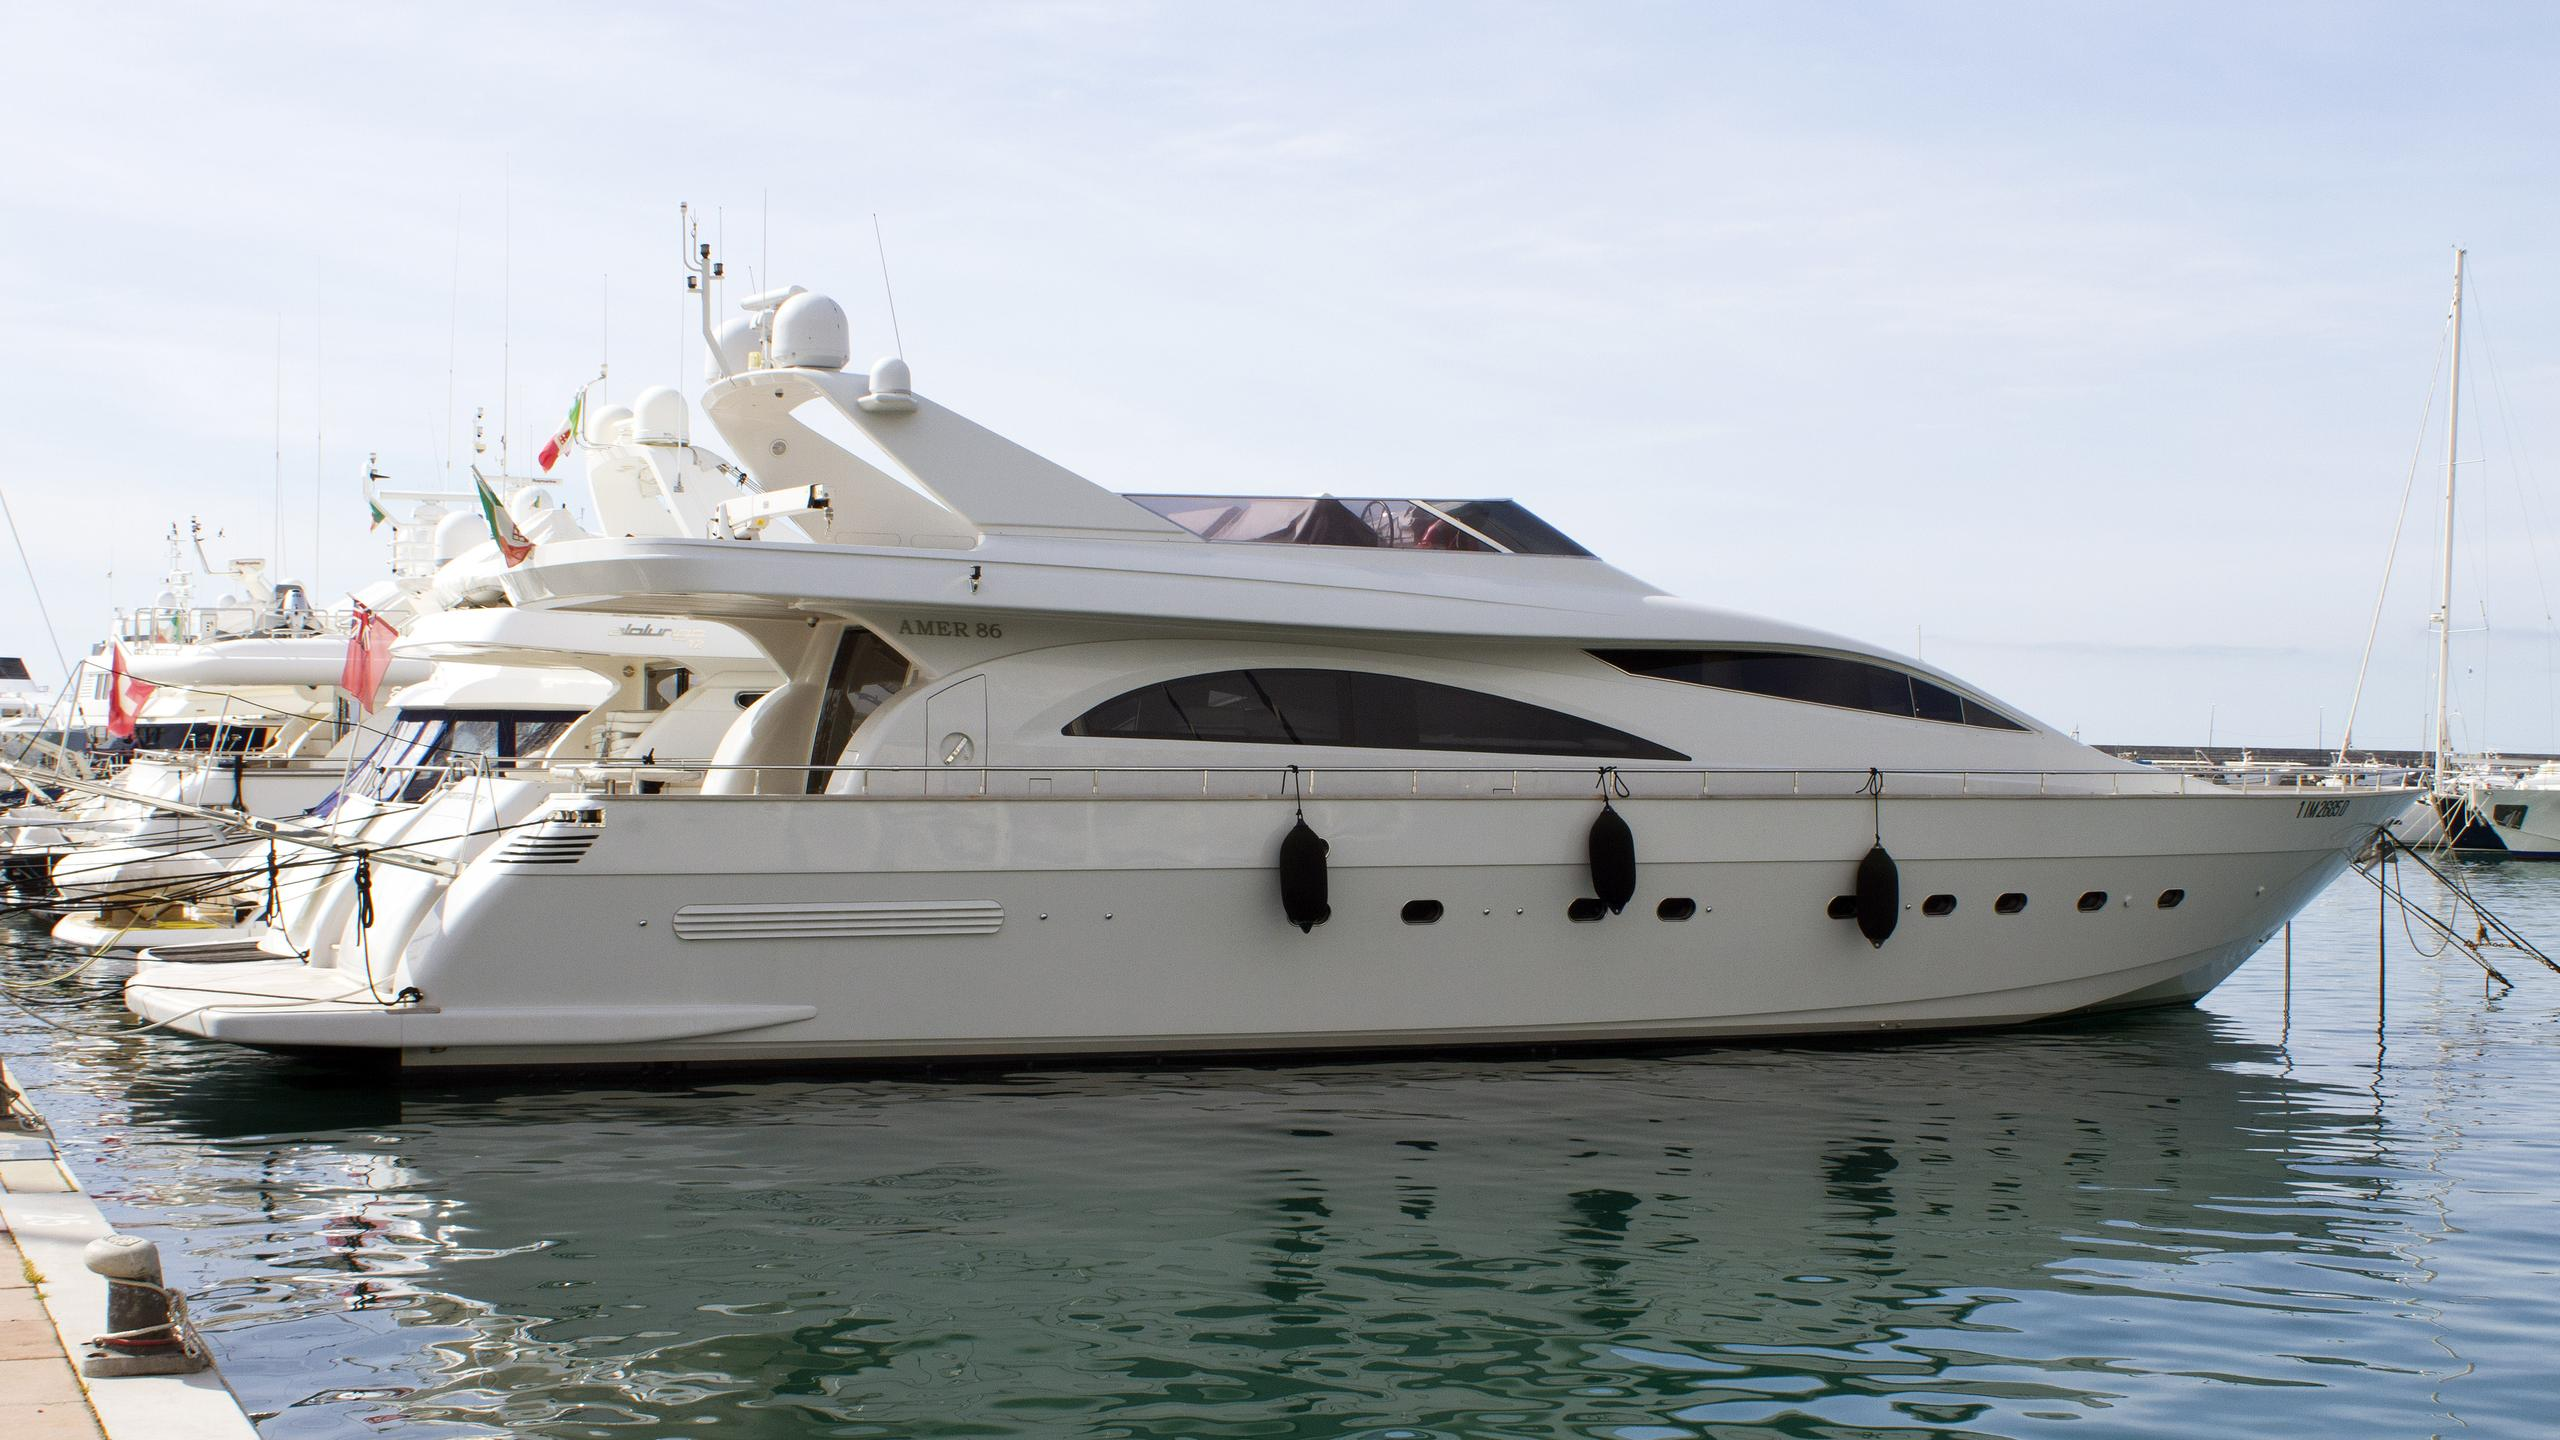 francamarina-motor-yacht-permare-amer-86-2007-26m-profile